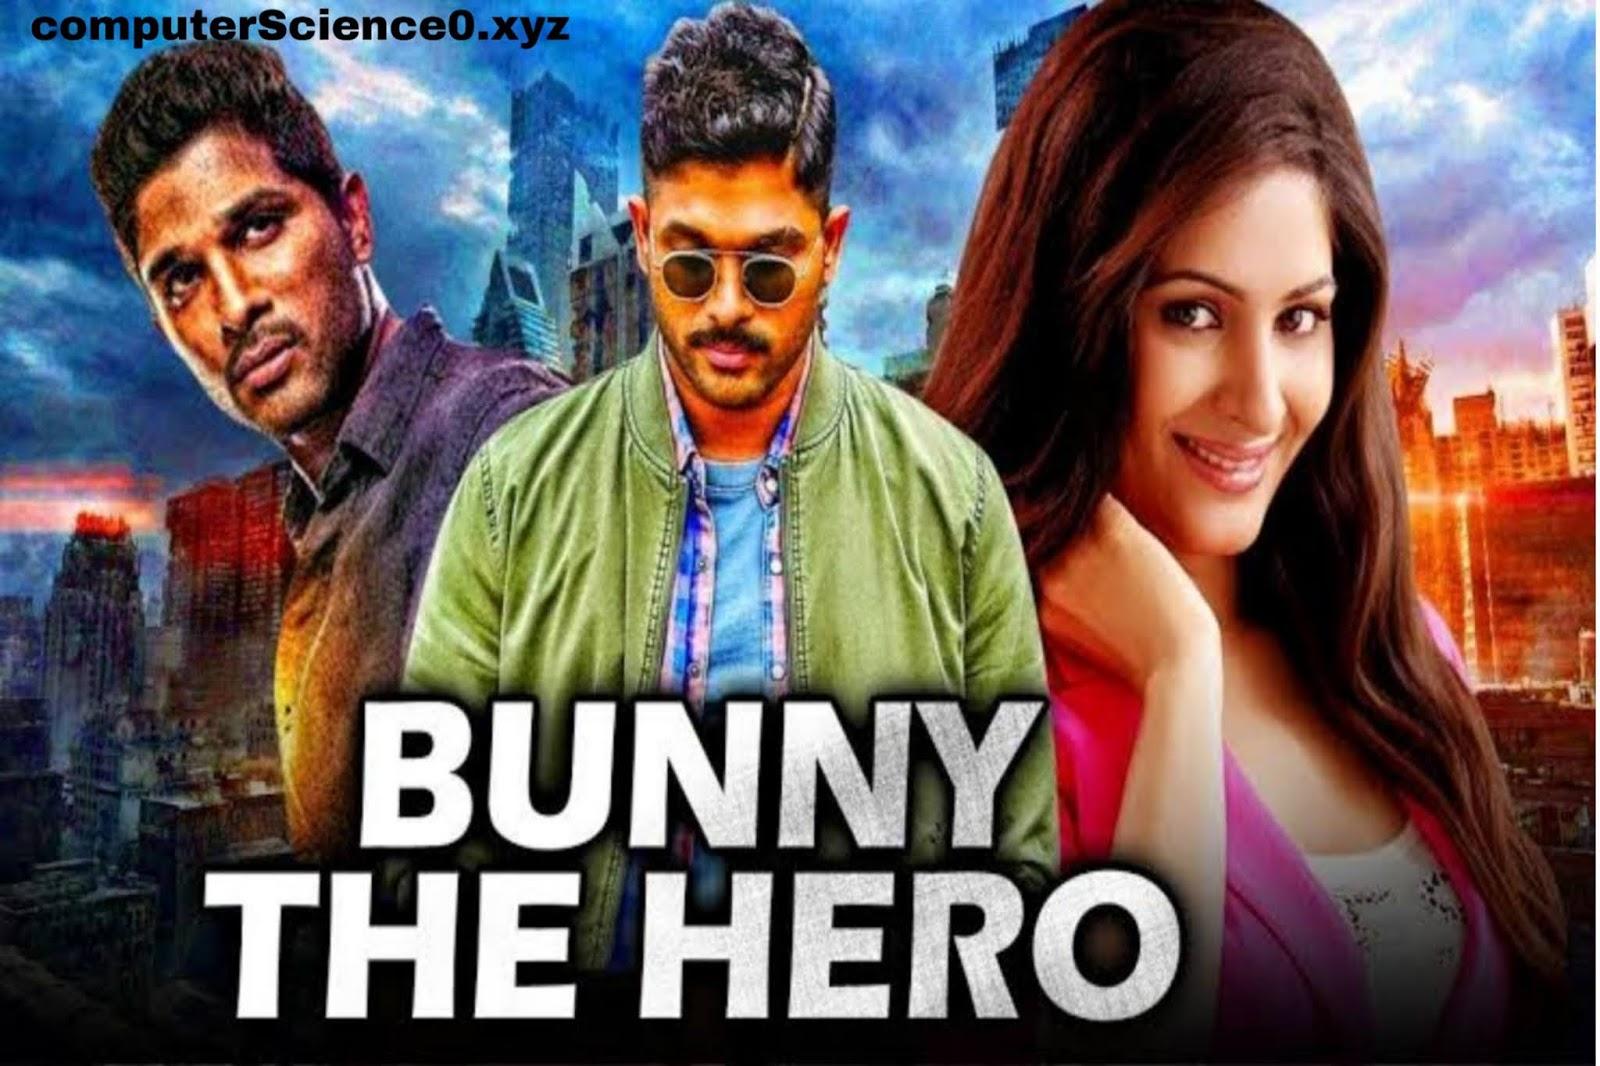 Bunny the Hero Allu Arjun's Top 19 movies of all time